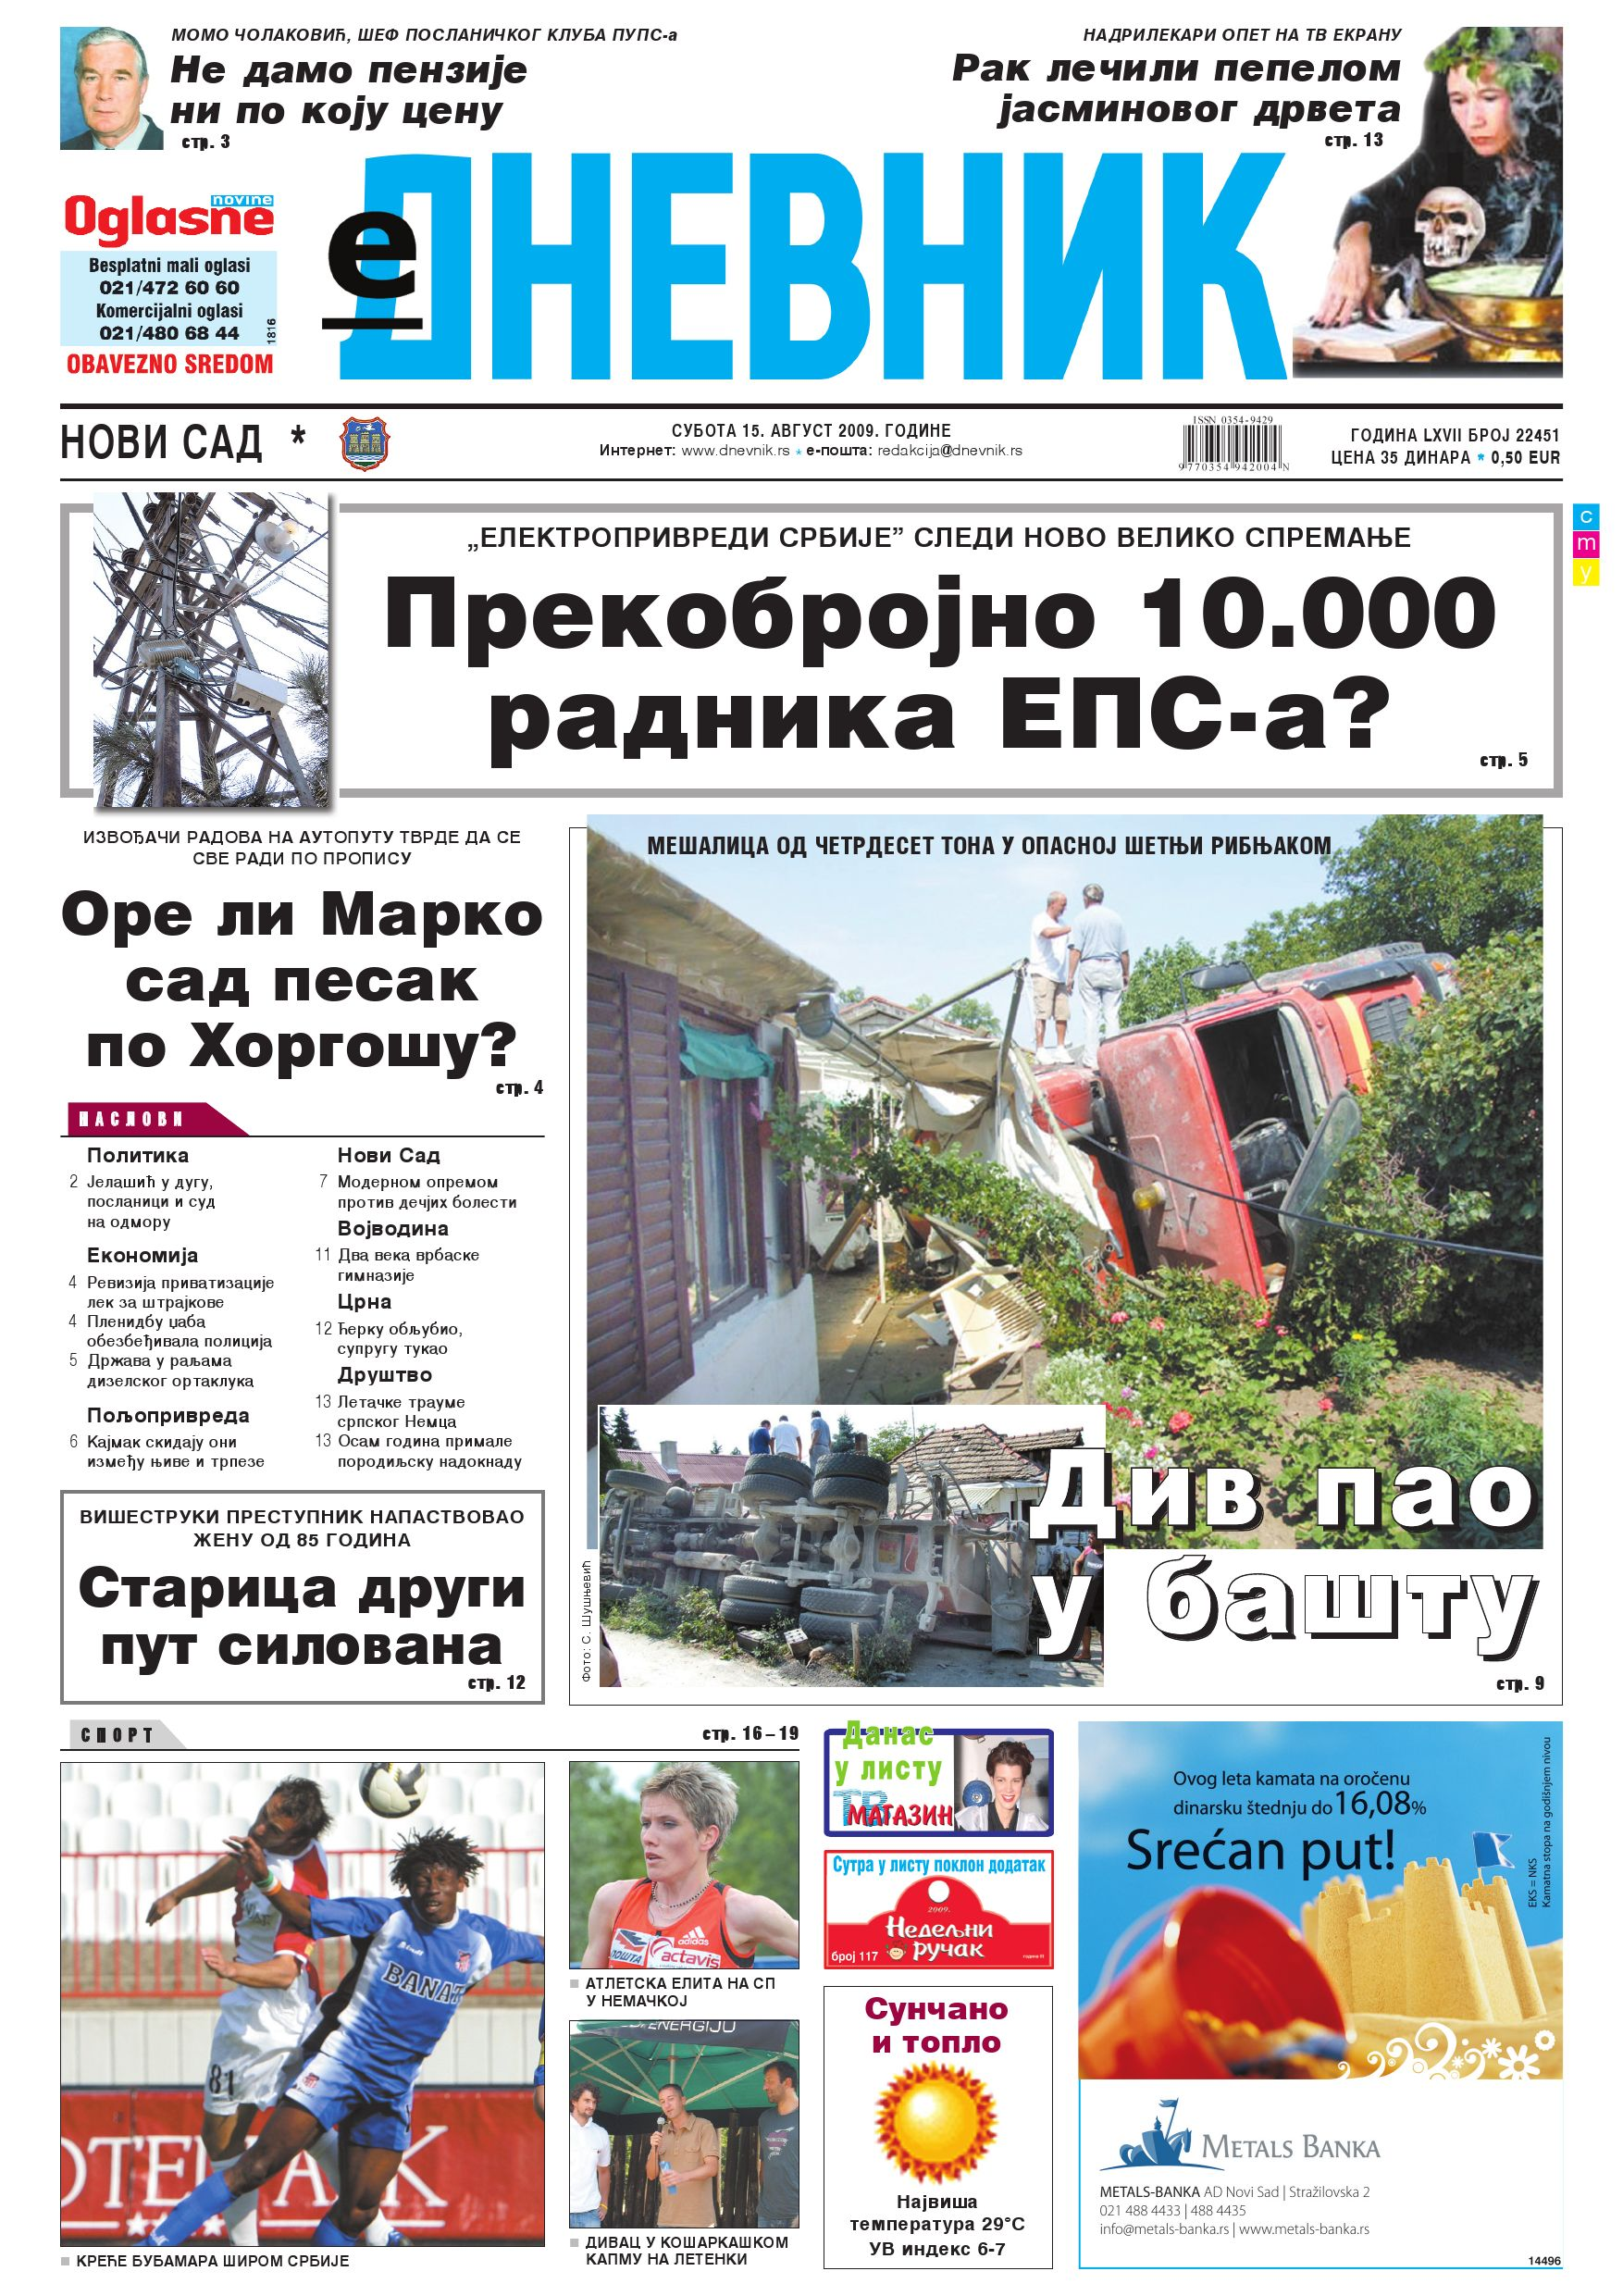 Alba Jove Olesti Porno dnevnik 15.avgust 2009.jovan radosavljevic - issuu